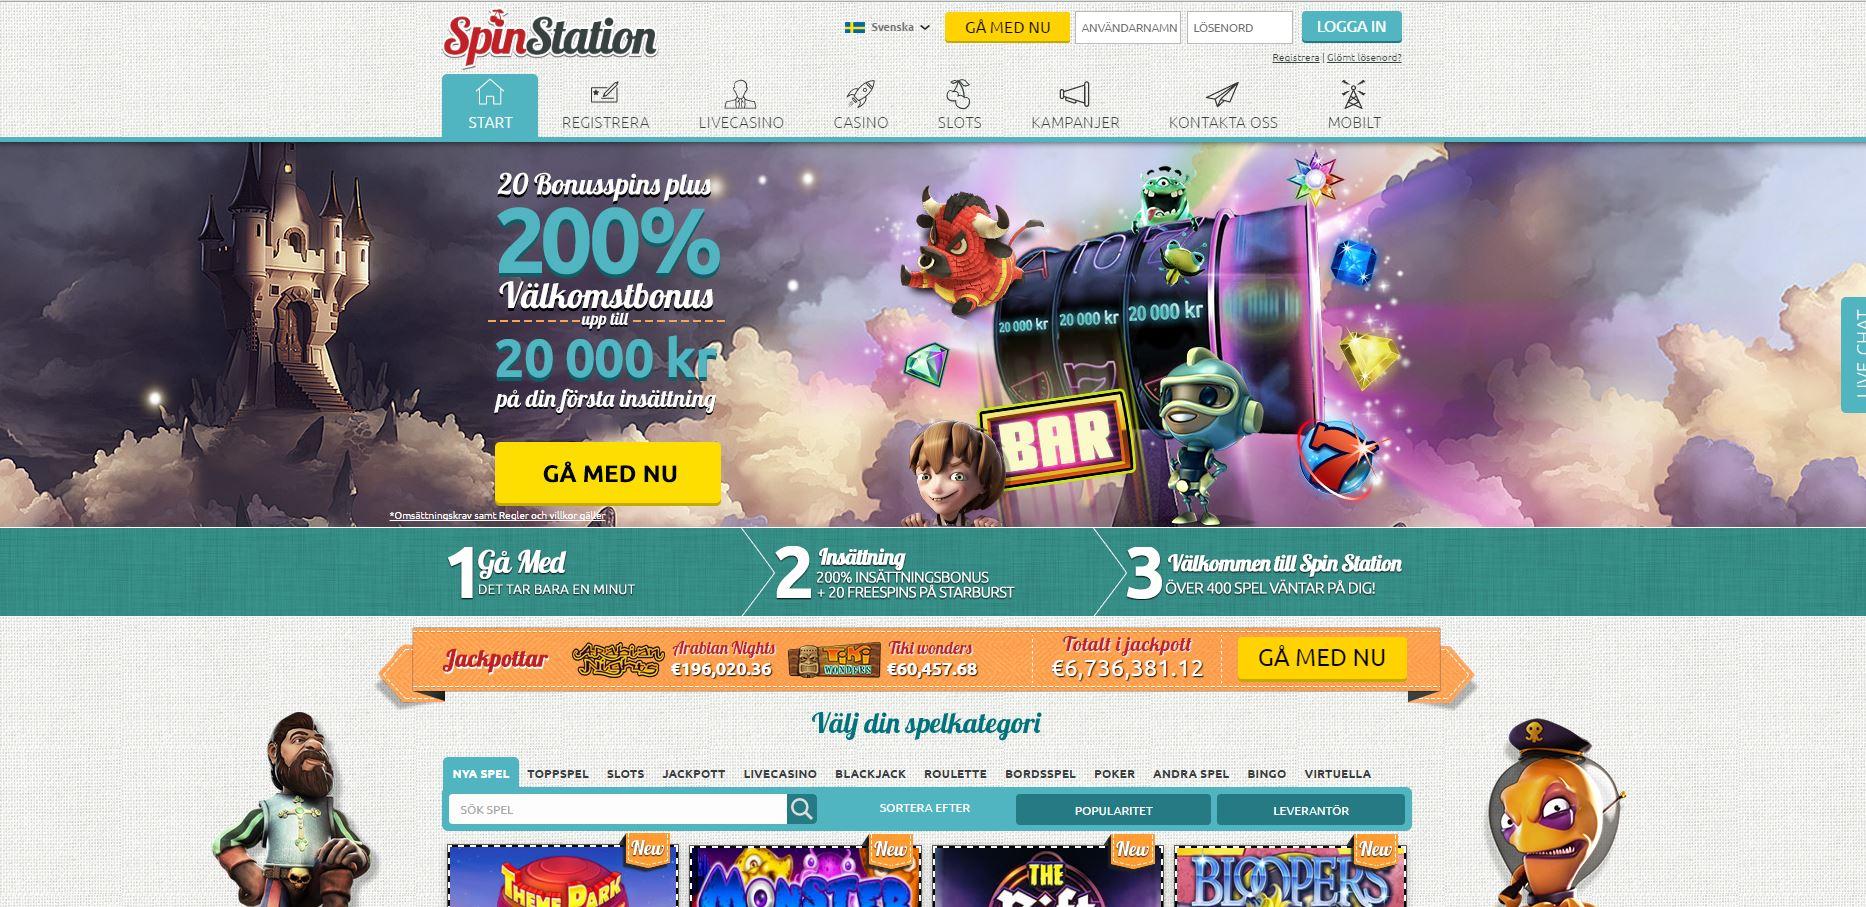 Bonusspel spelautomater - 36523